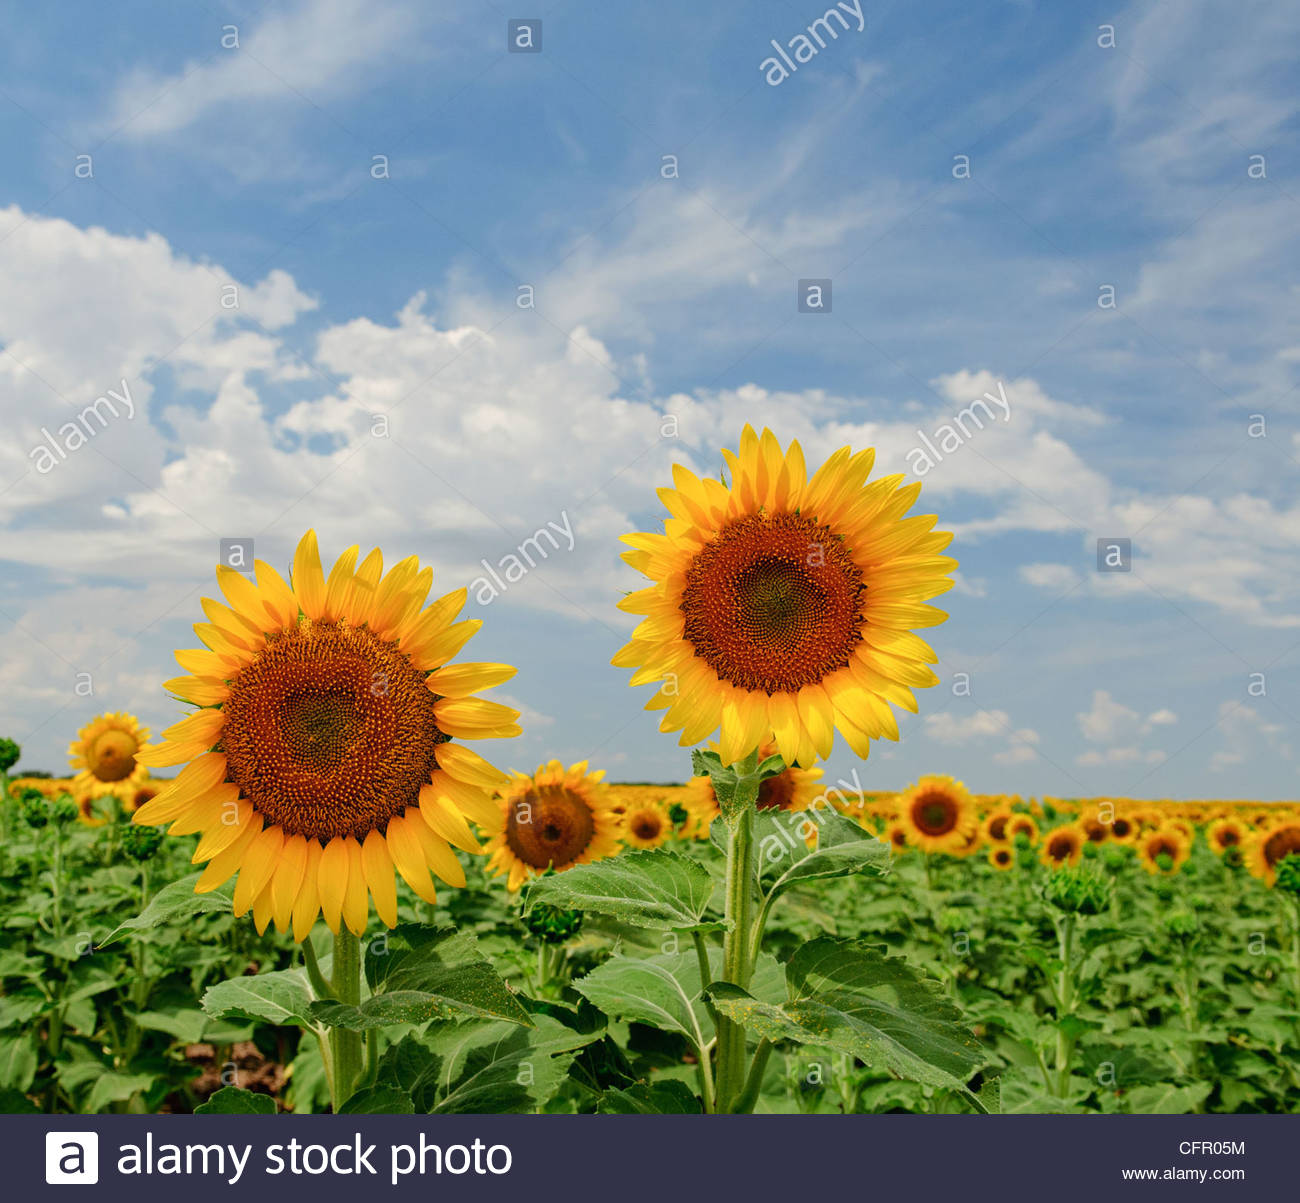 Kansas Sunflowers, Sunflower crop, Partridge, KS, July 31, 2011 - Stock Image